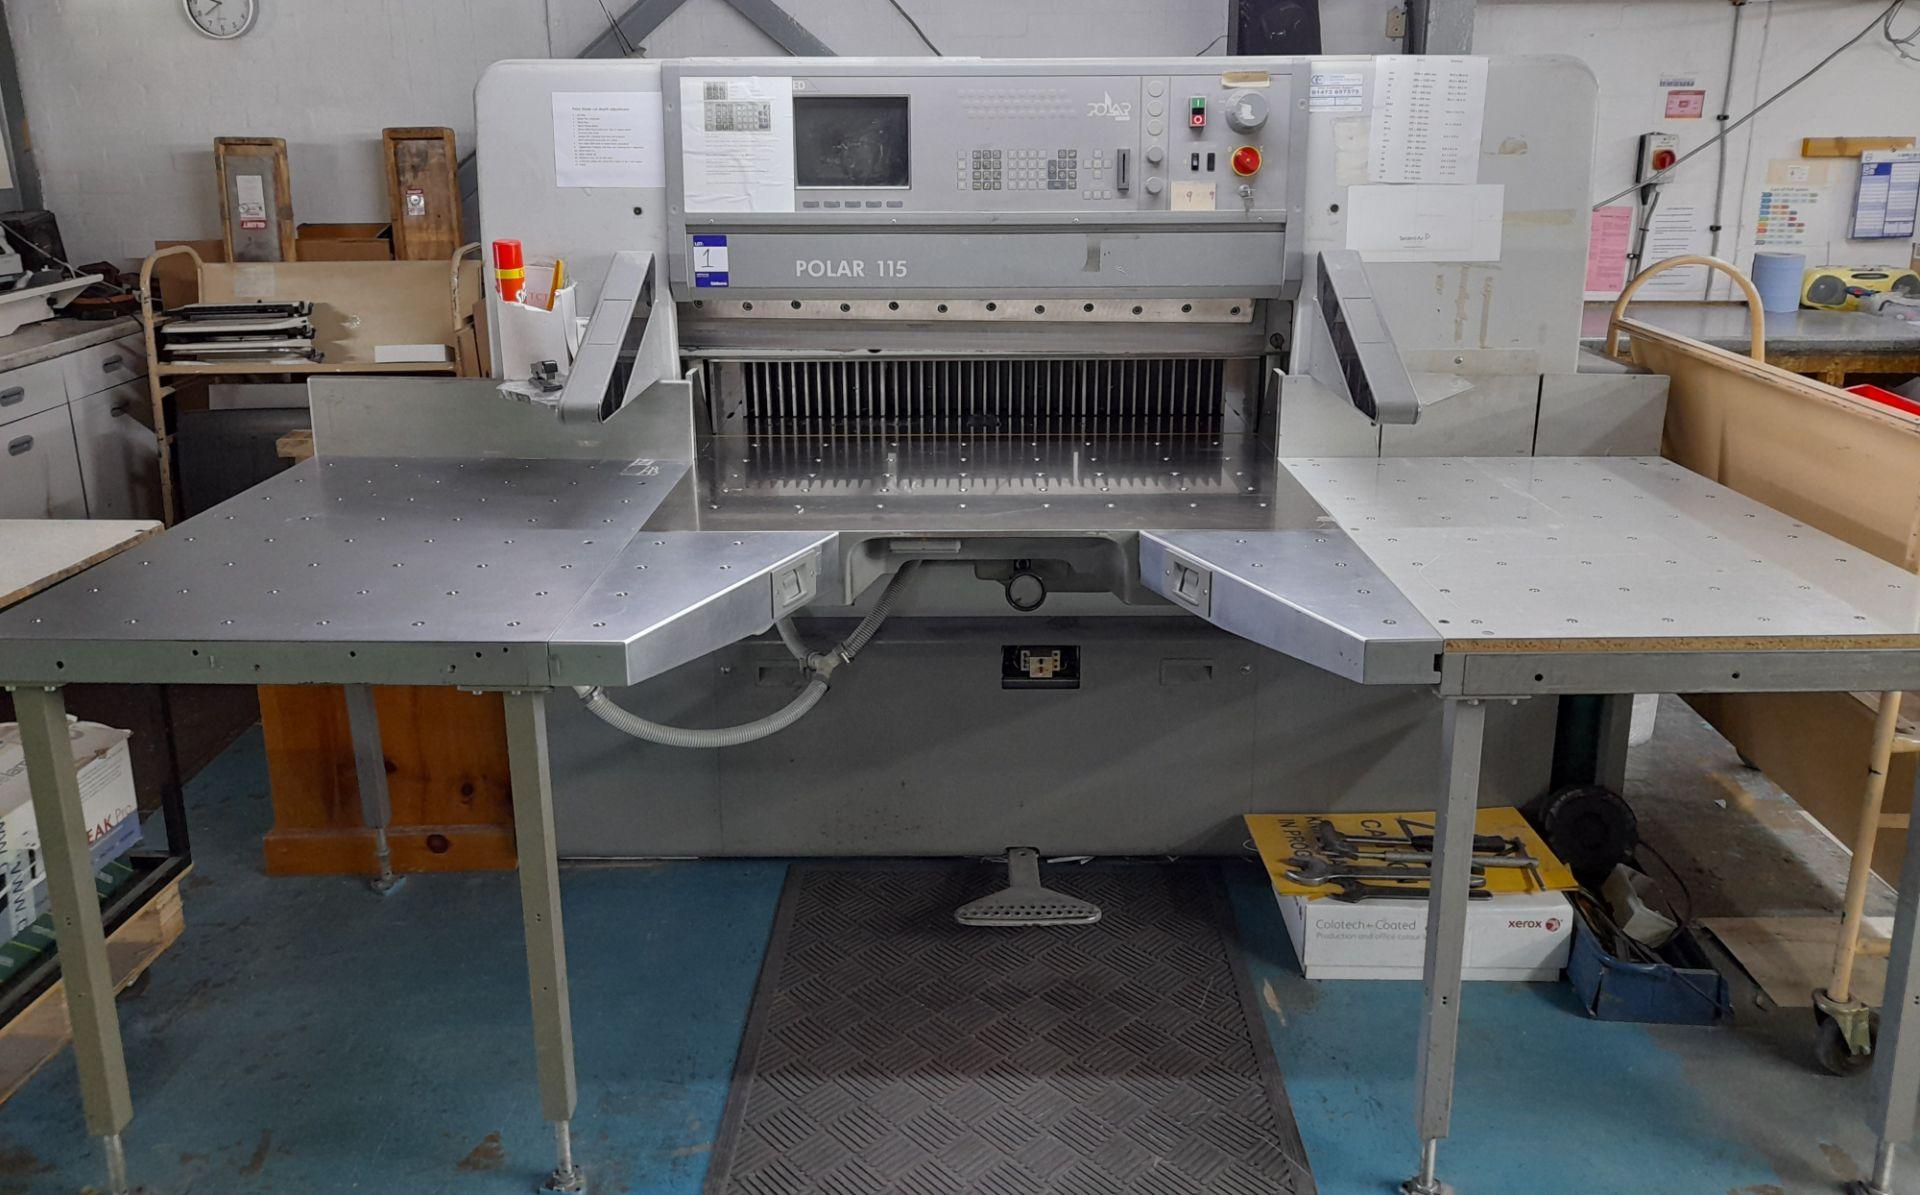 Polar Mohr 115 ED guillotine, Machine Number: 7031 - Image 2 of 9